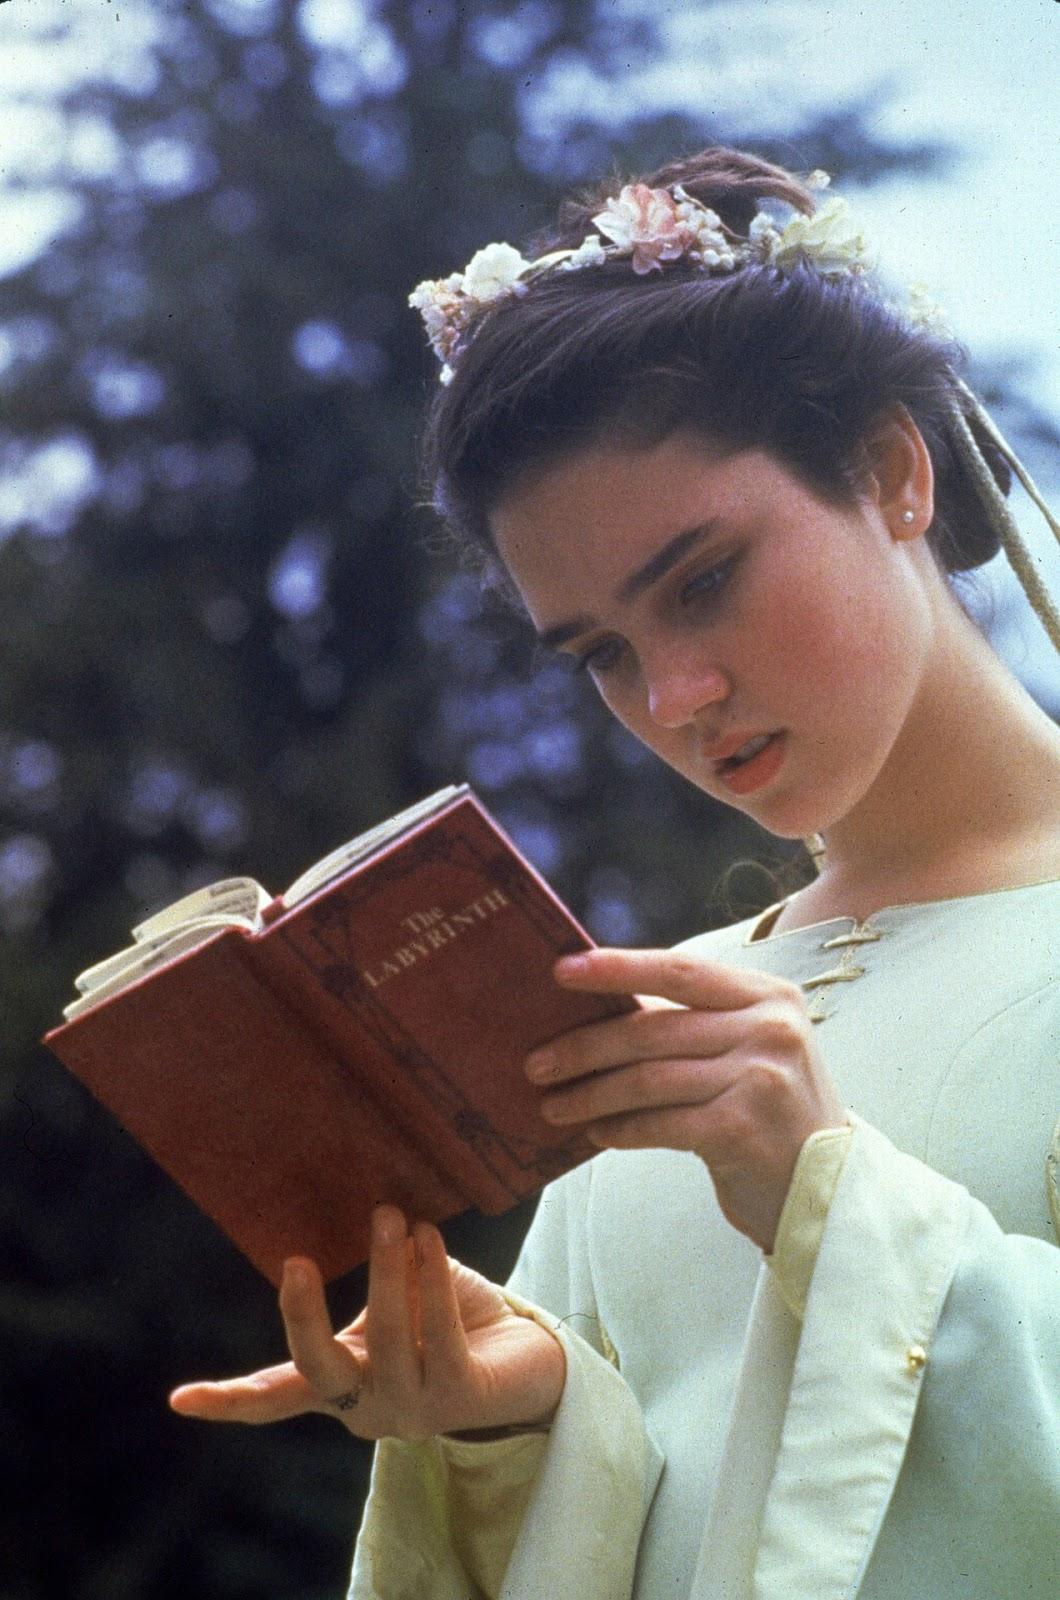 FILMY KOSTIUMOWE: Labyrinth (1986) Labyrinth 1986 Sarah